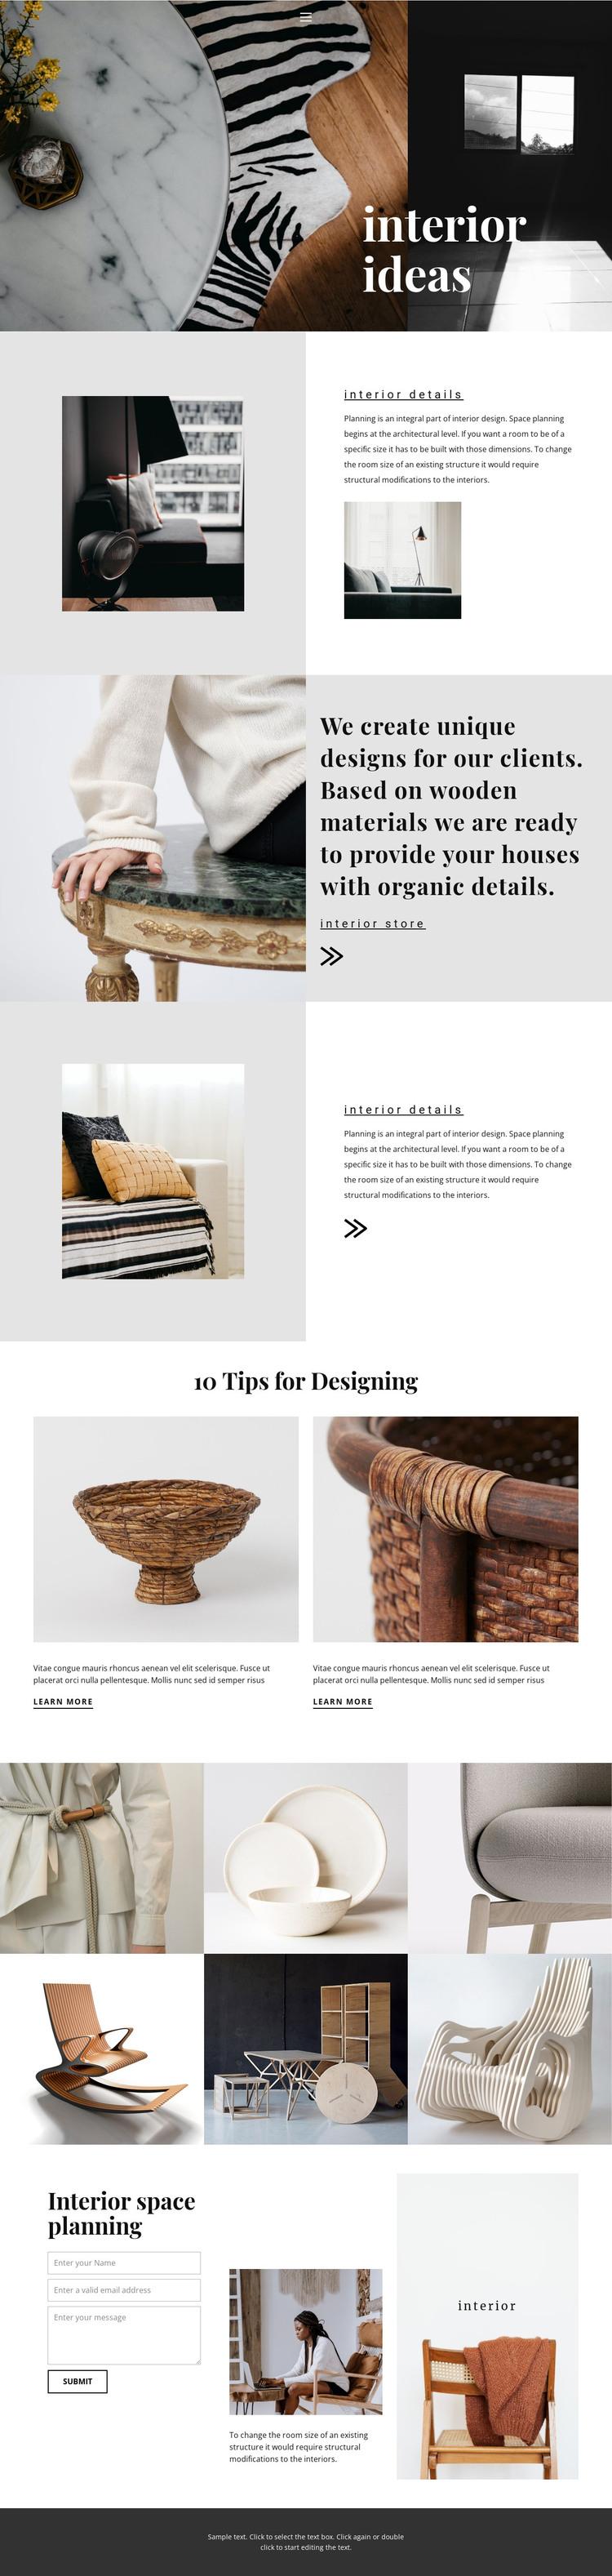 New interior ideas Web Design